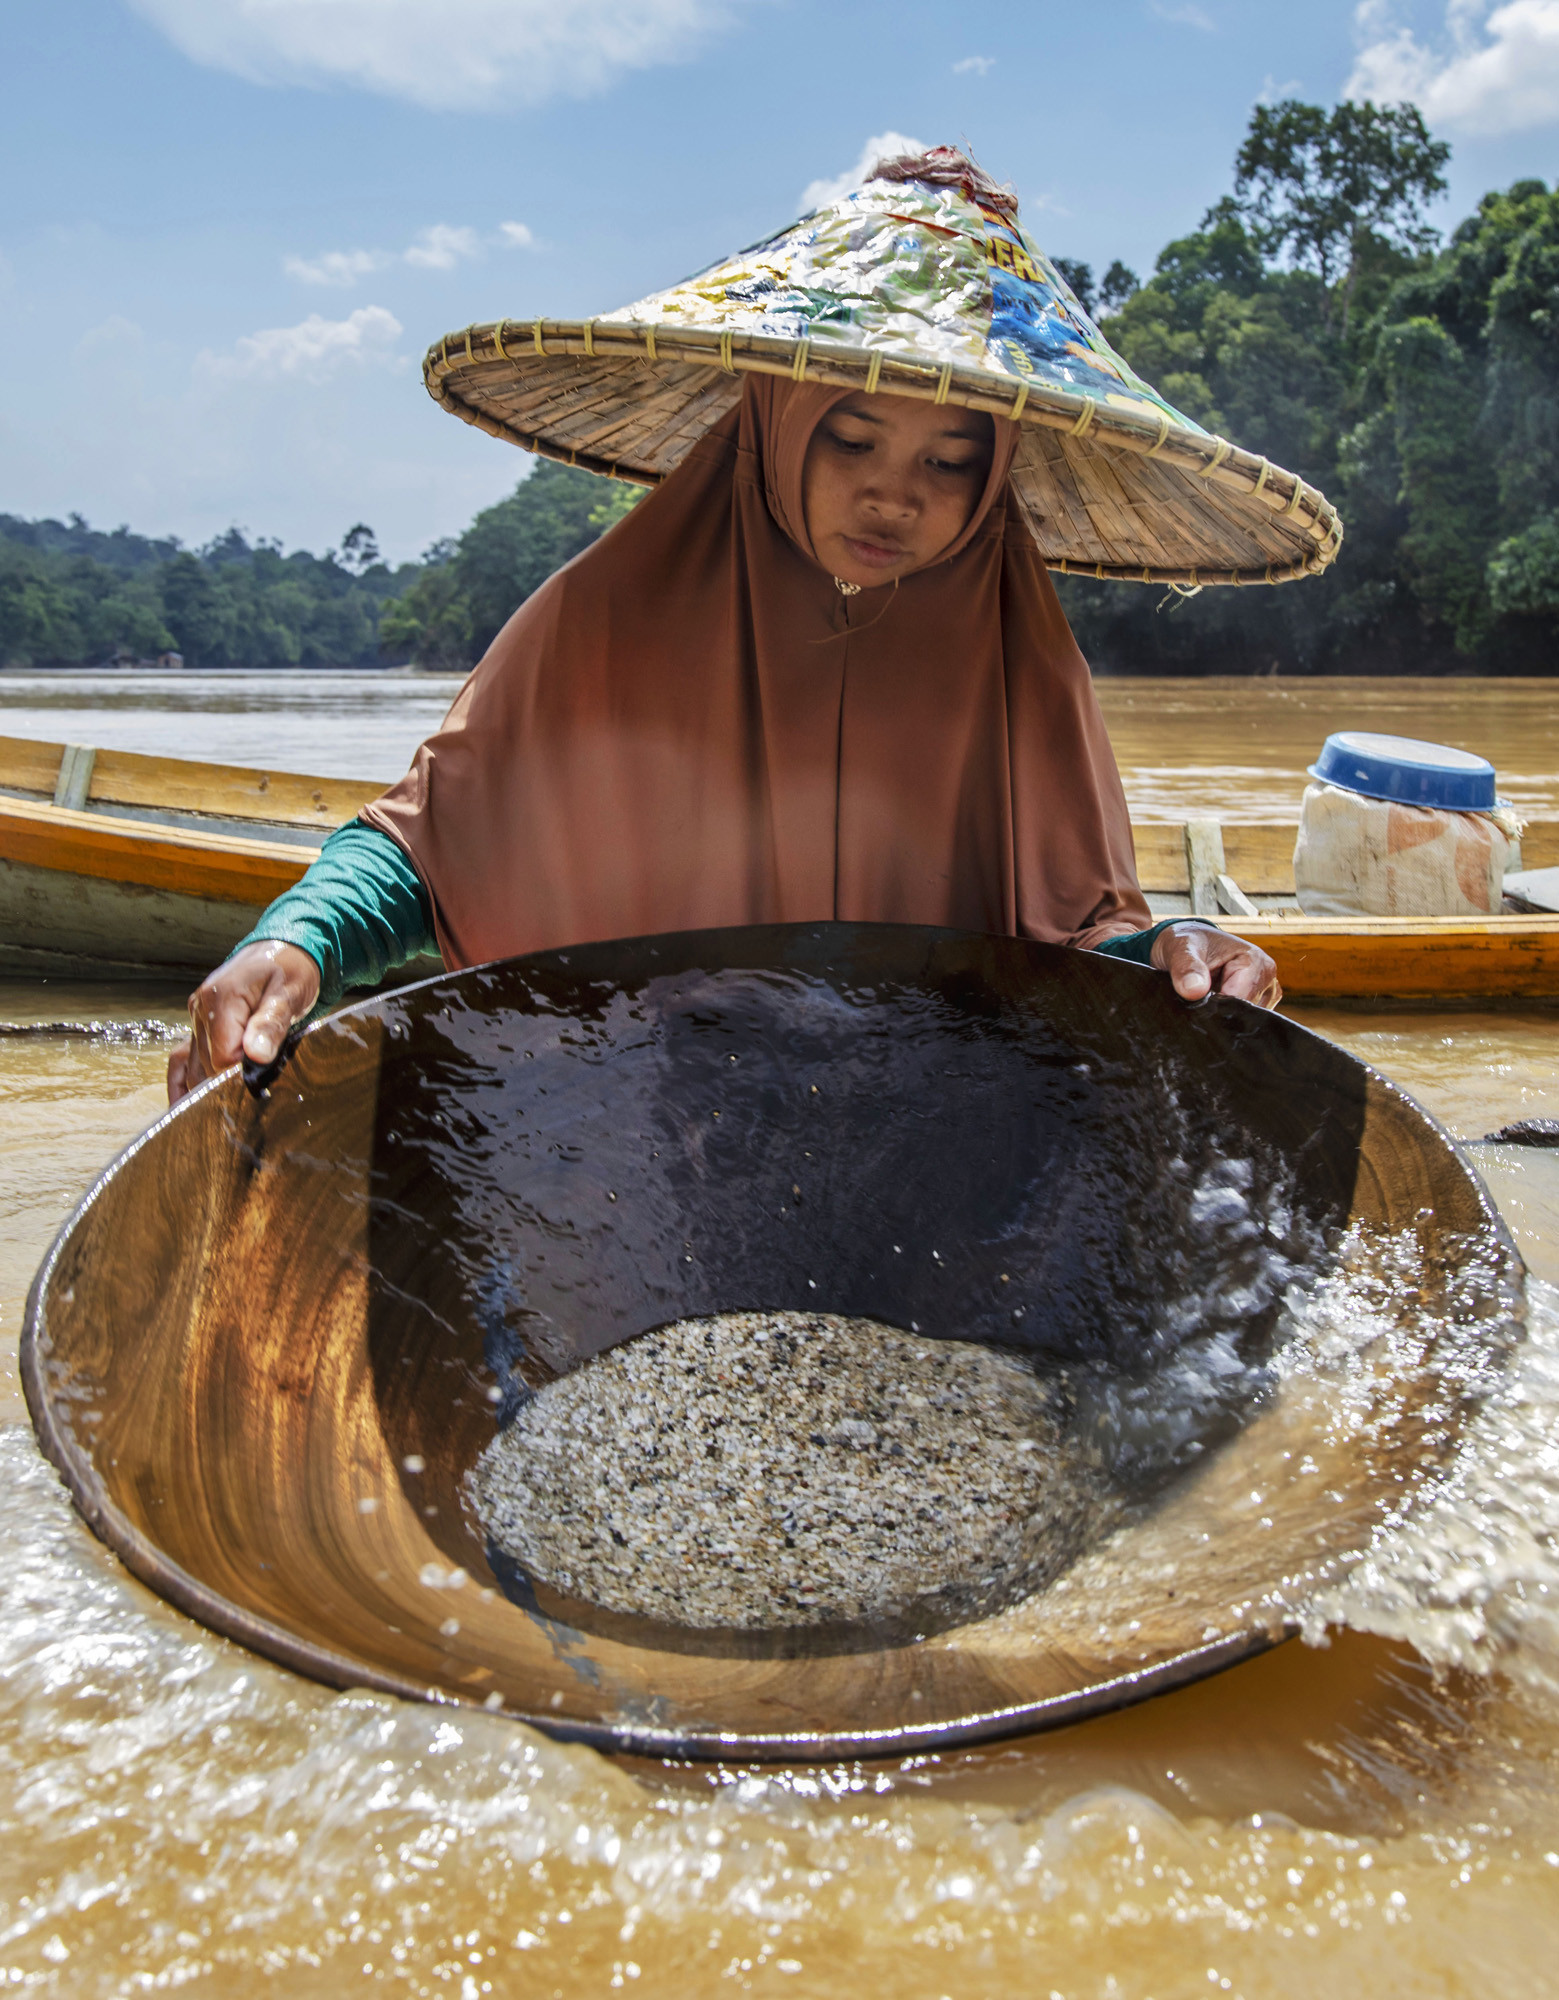 Penambangan emas dan berlian secara tradisional di Kalimantan Barat.